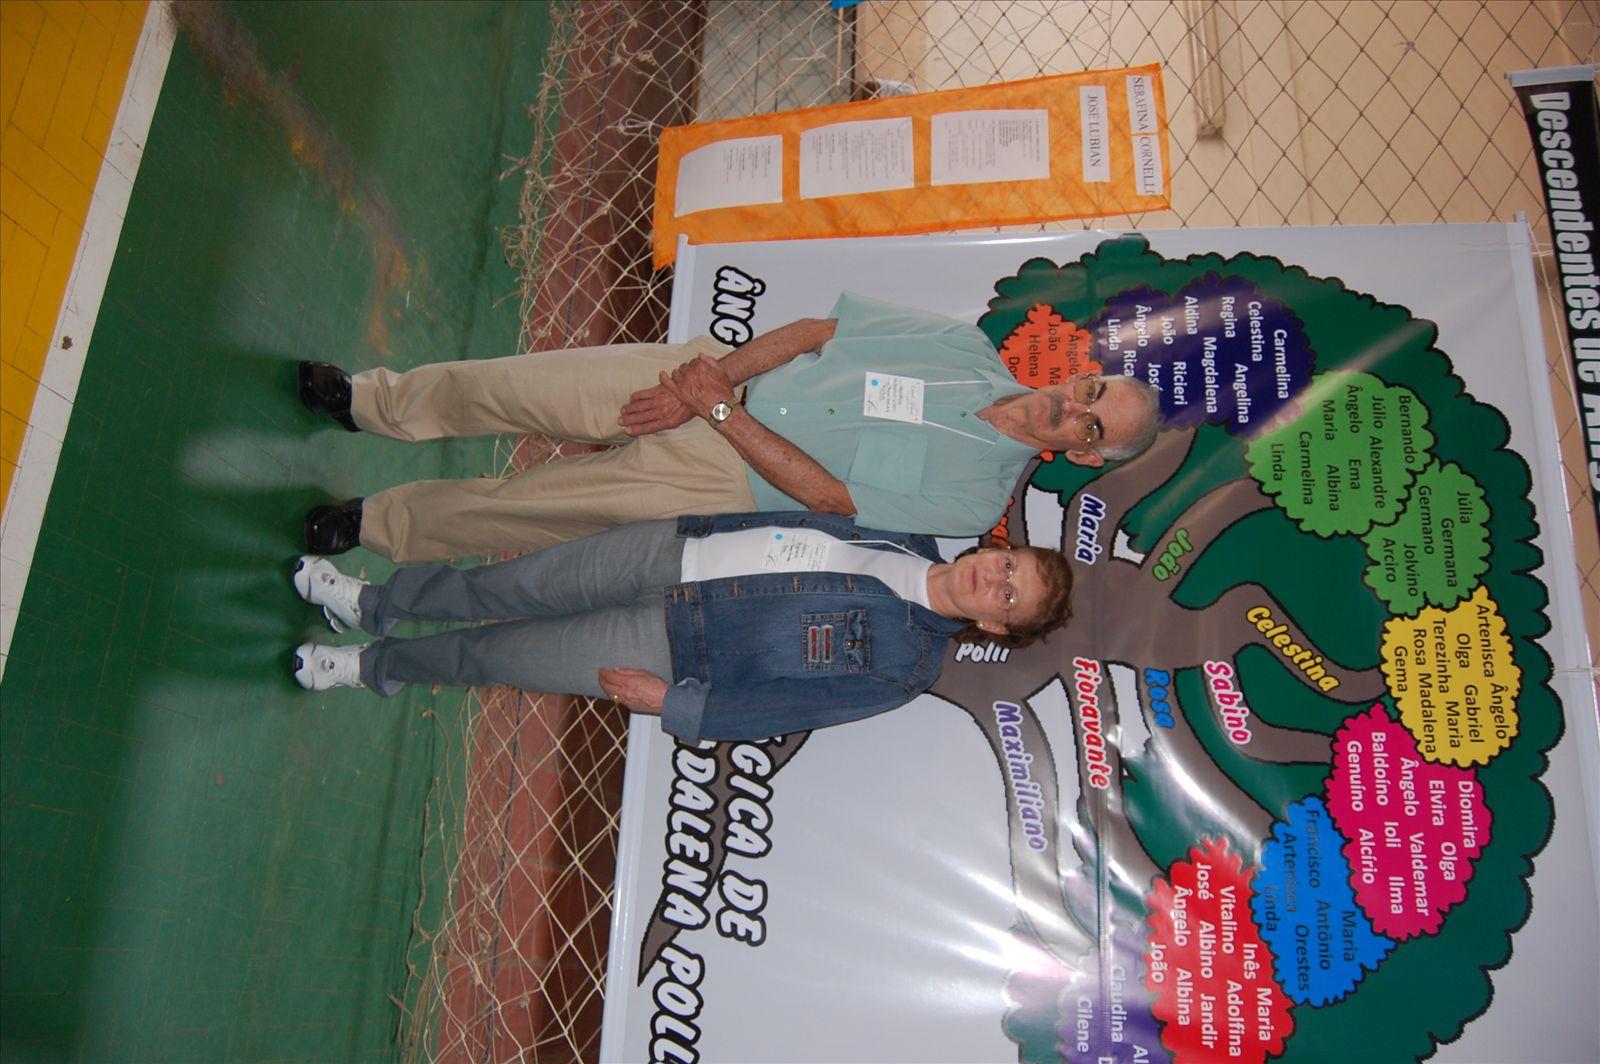 2º Encontro Família Cornelli - 11.10.2009 (74)_0